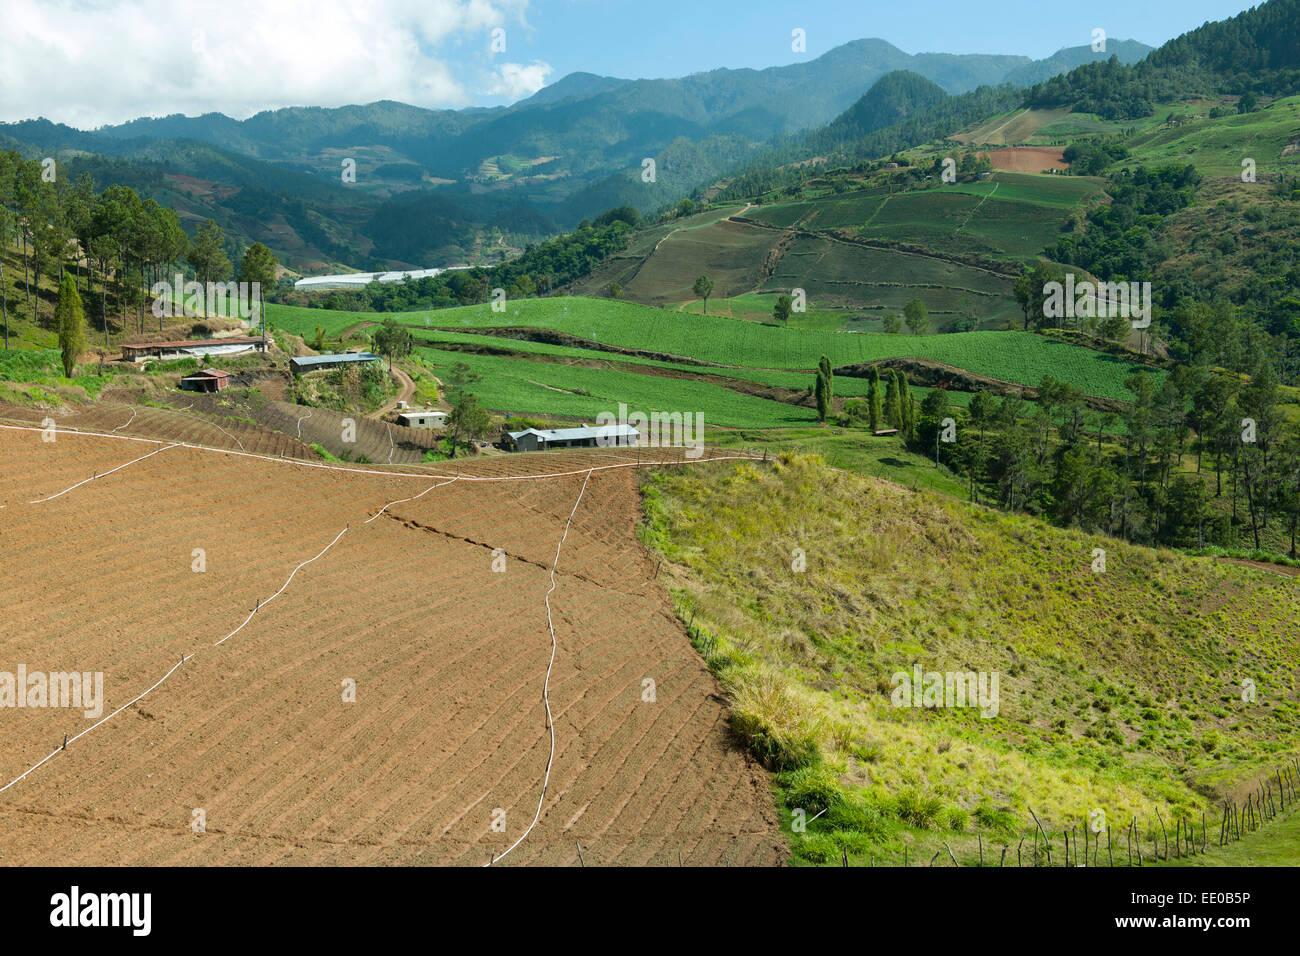 Dominikanische Republik, Cordillera Central, Landschaft südlich von Constanza an der Carretera al Salto de Aguas Stock Photo